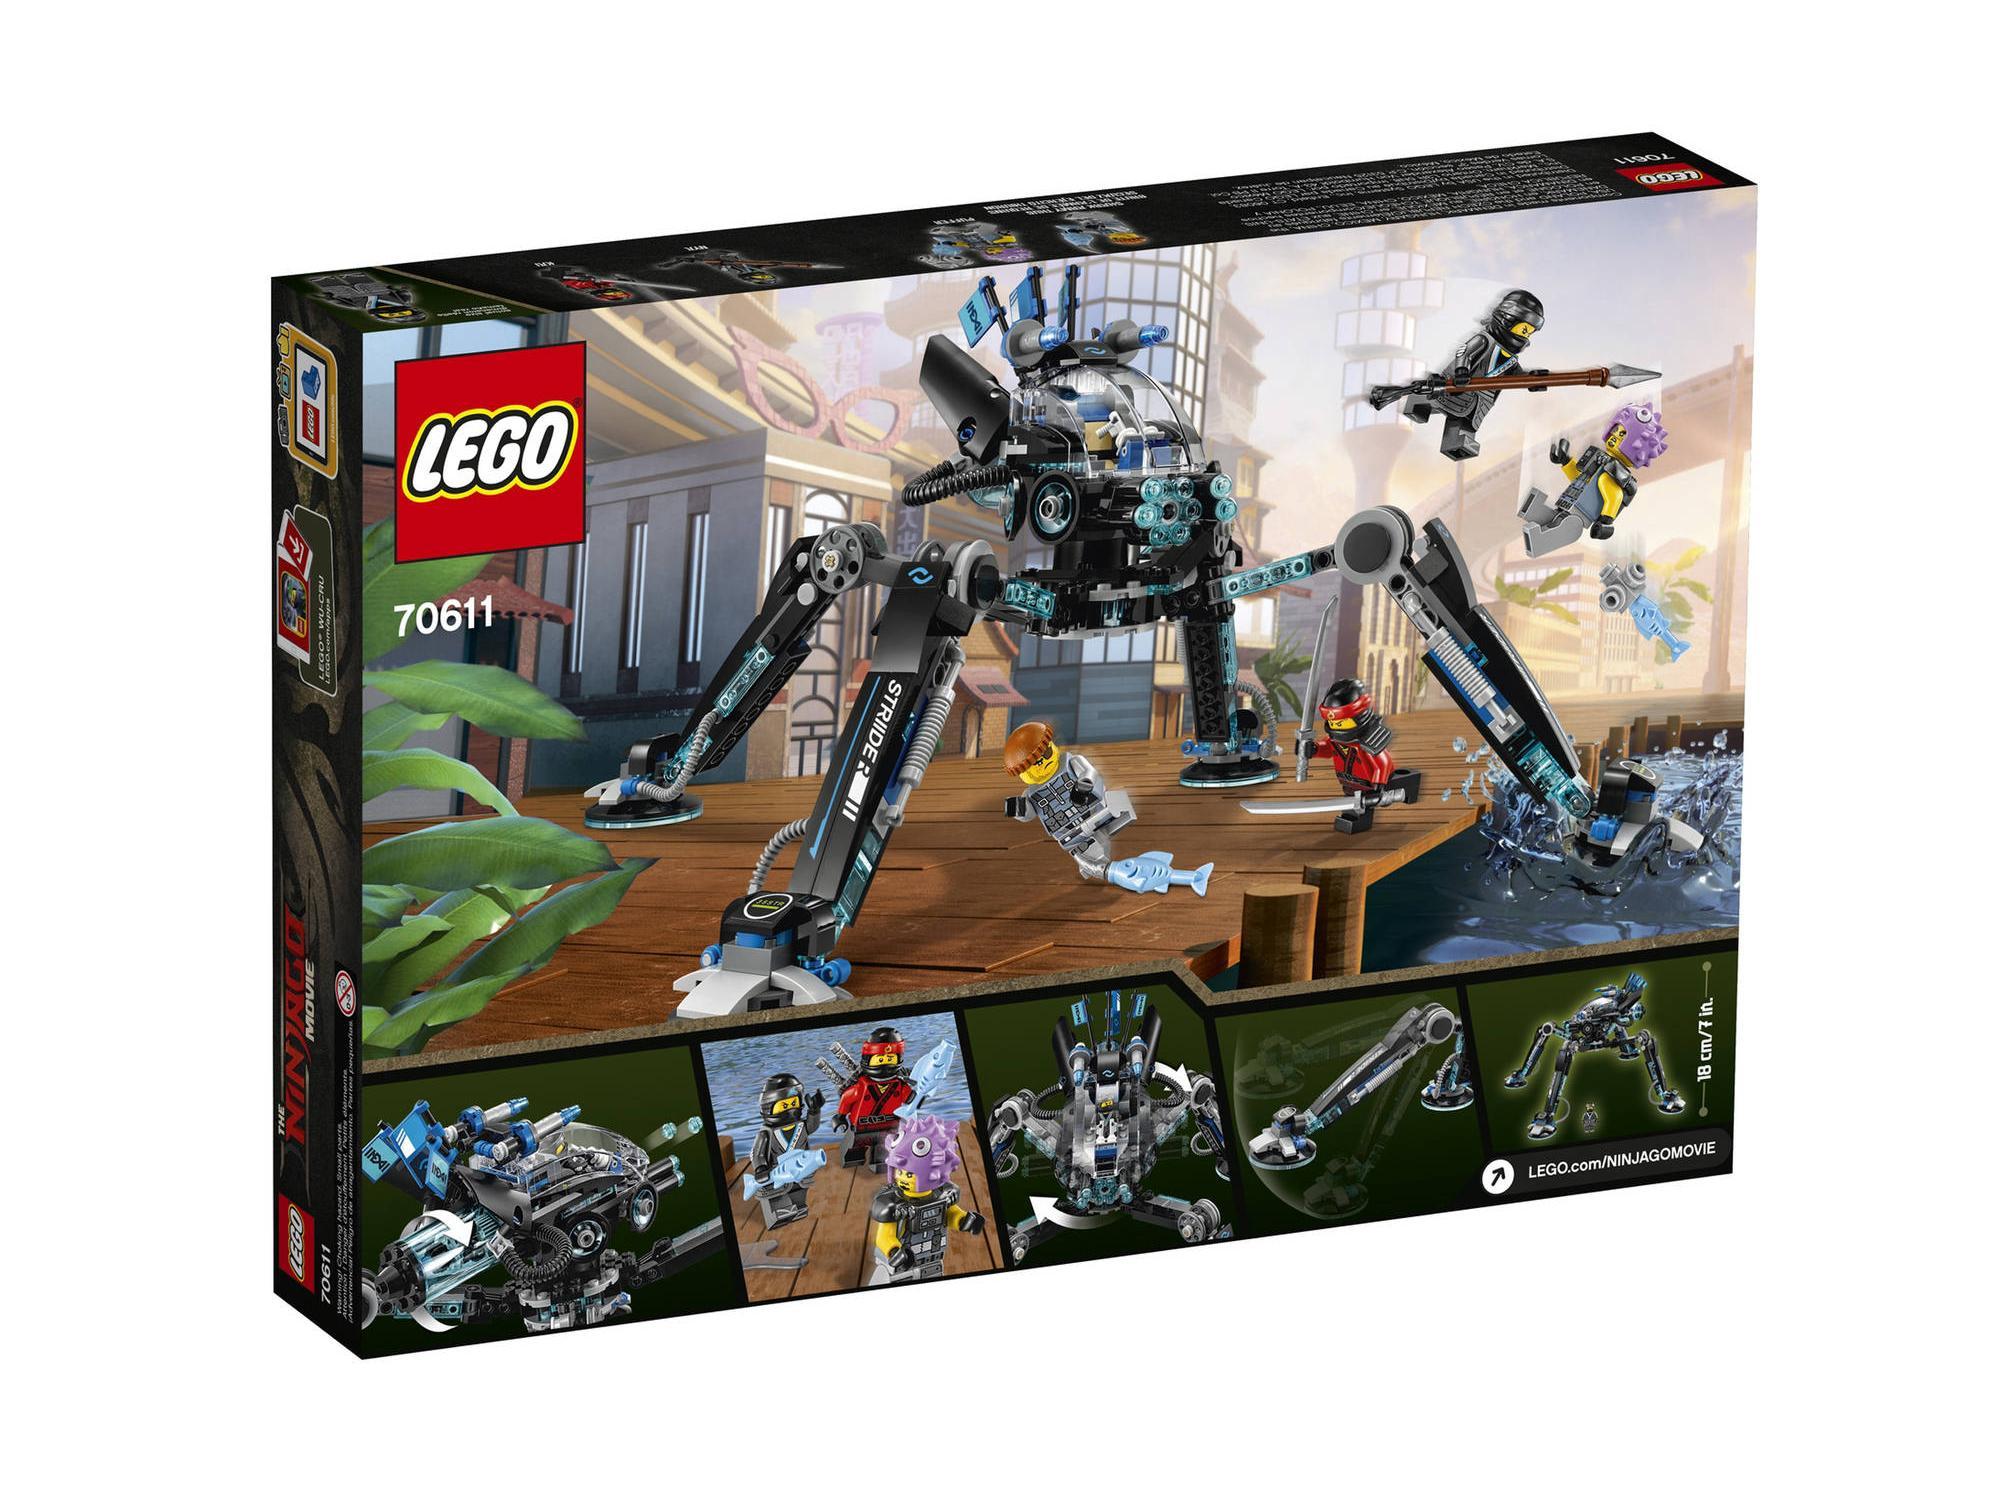 Diaper Walmart Ninjago For Coupons Free Lego Amazon Sets eEDYH2WI9